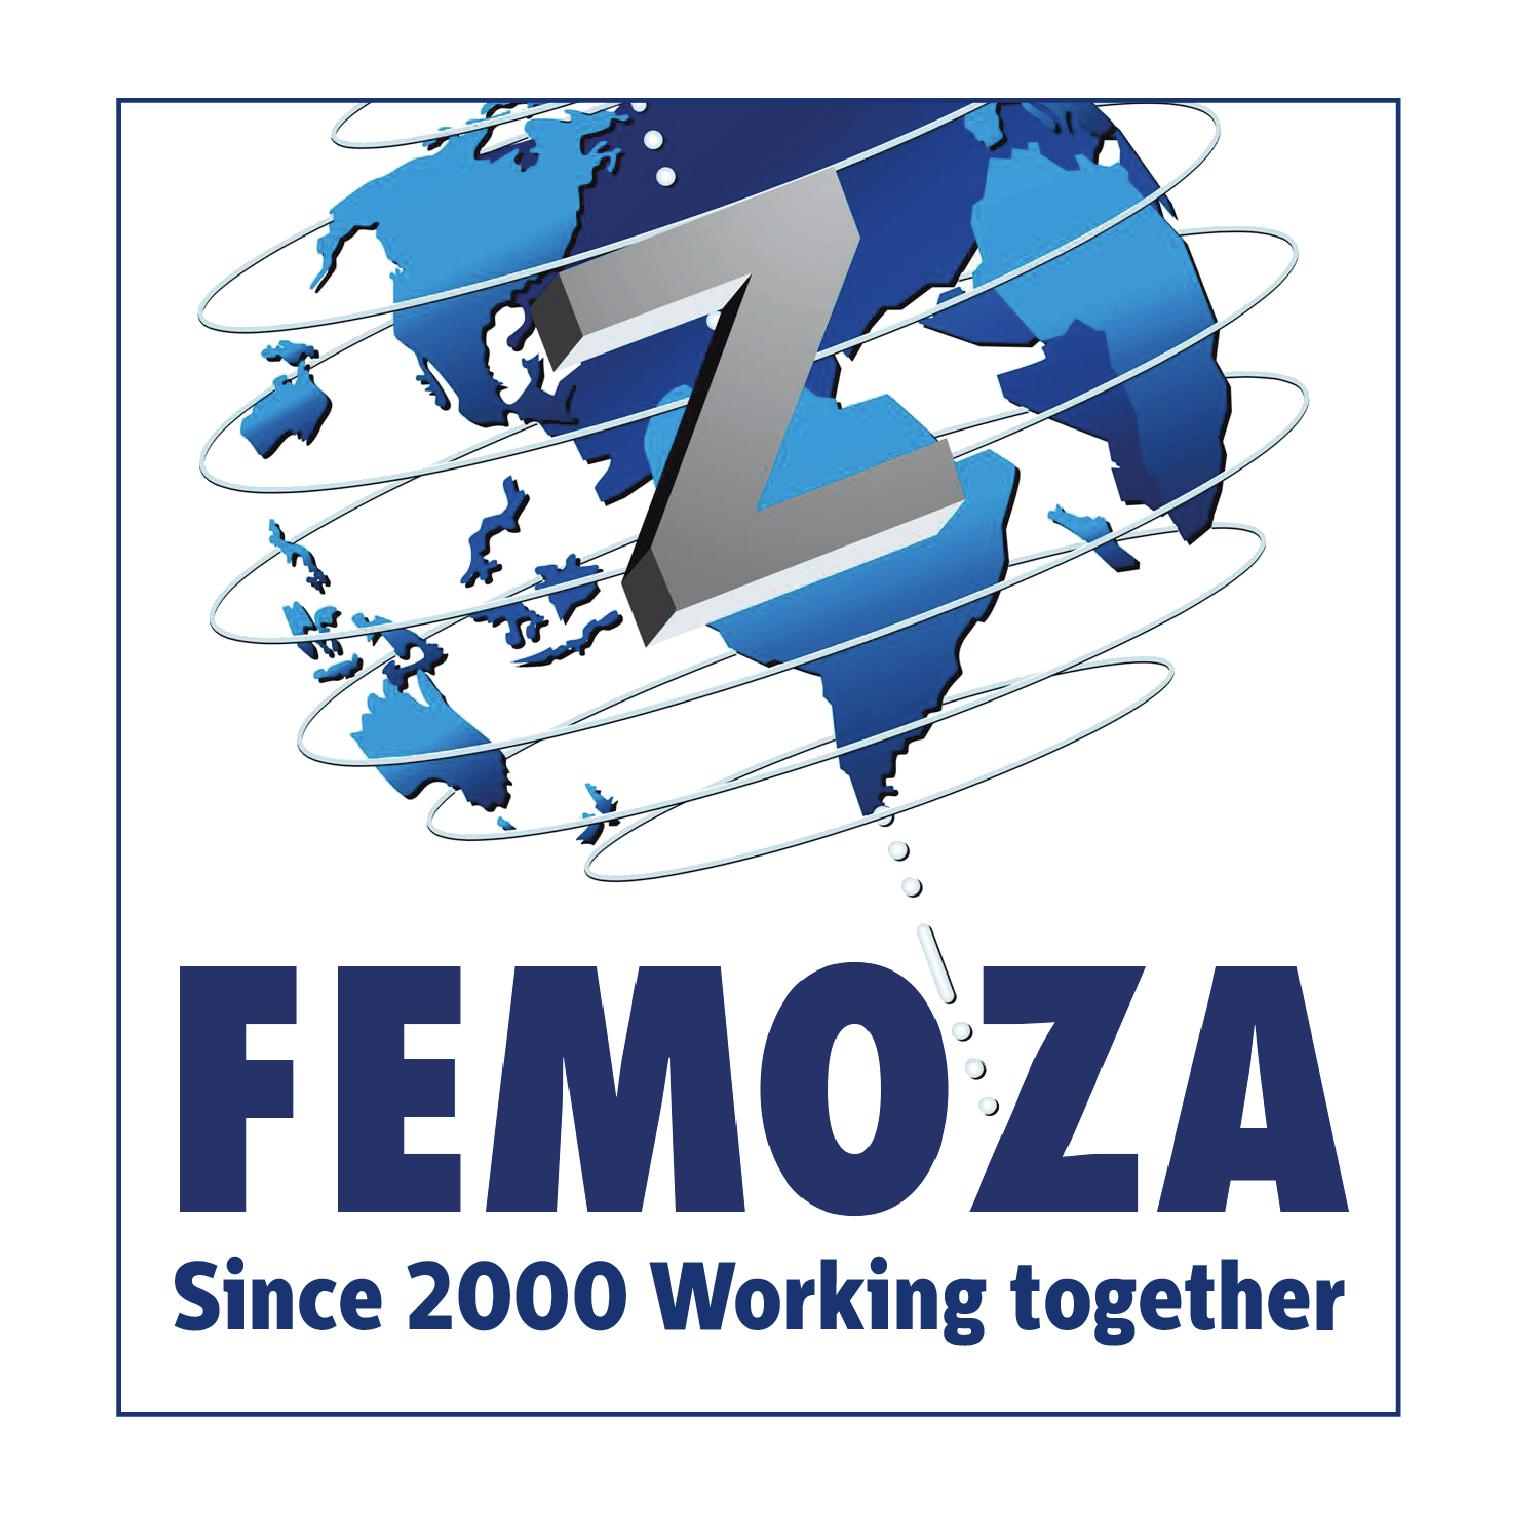 FEMOZA: The World Free & Special Economic Zones Federation